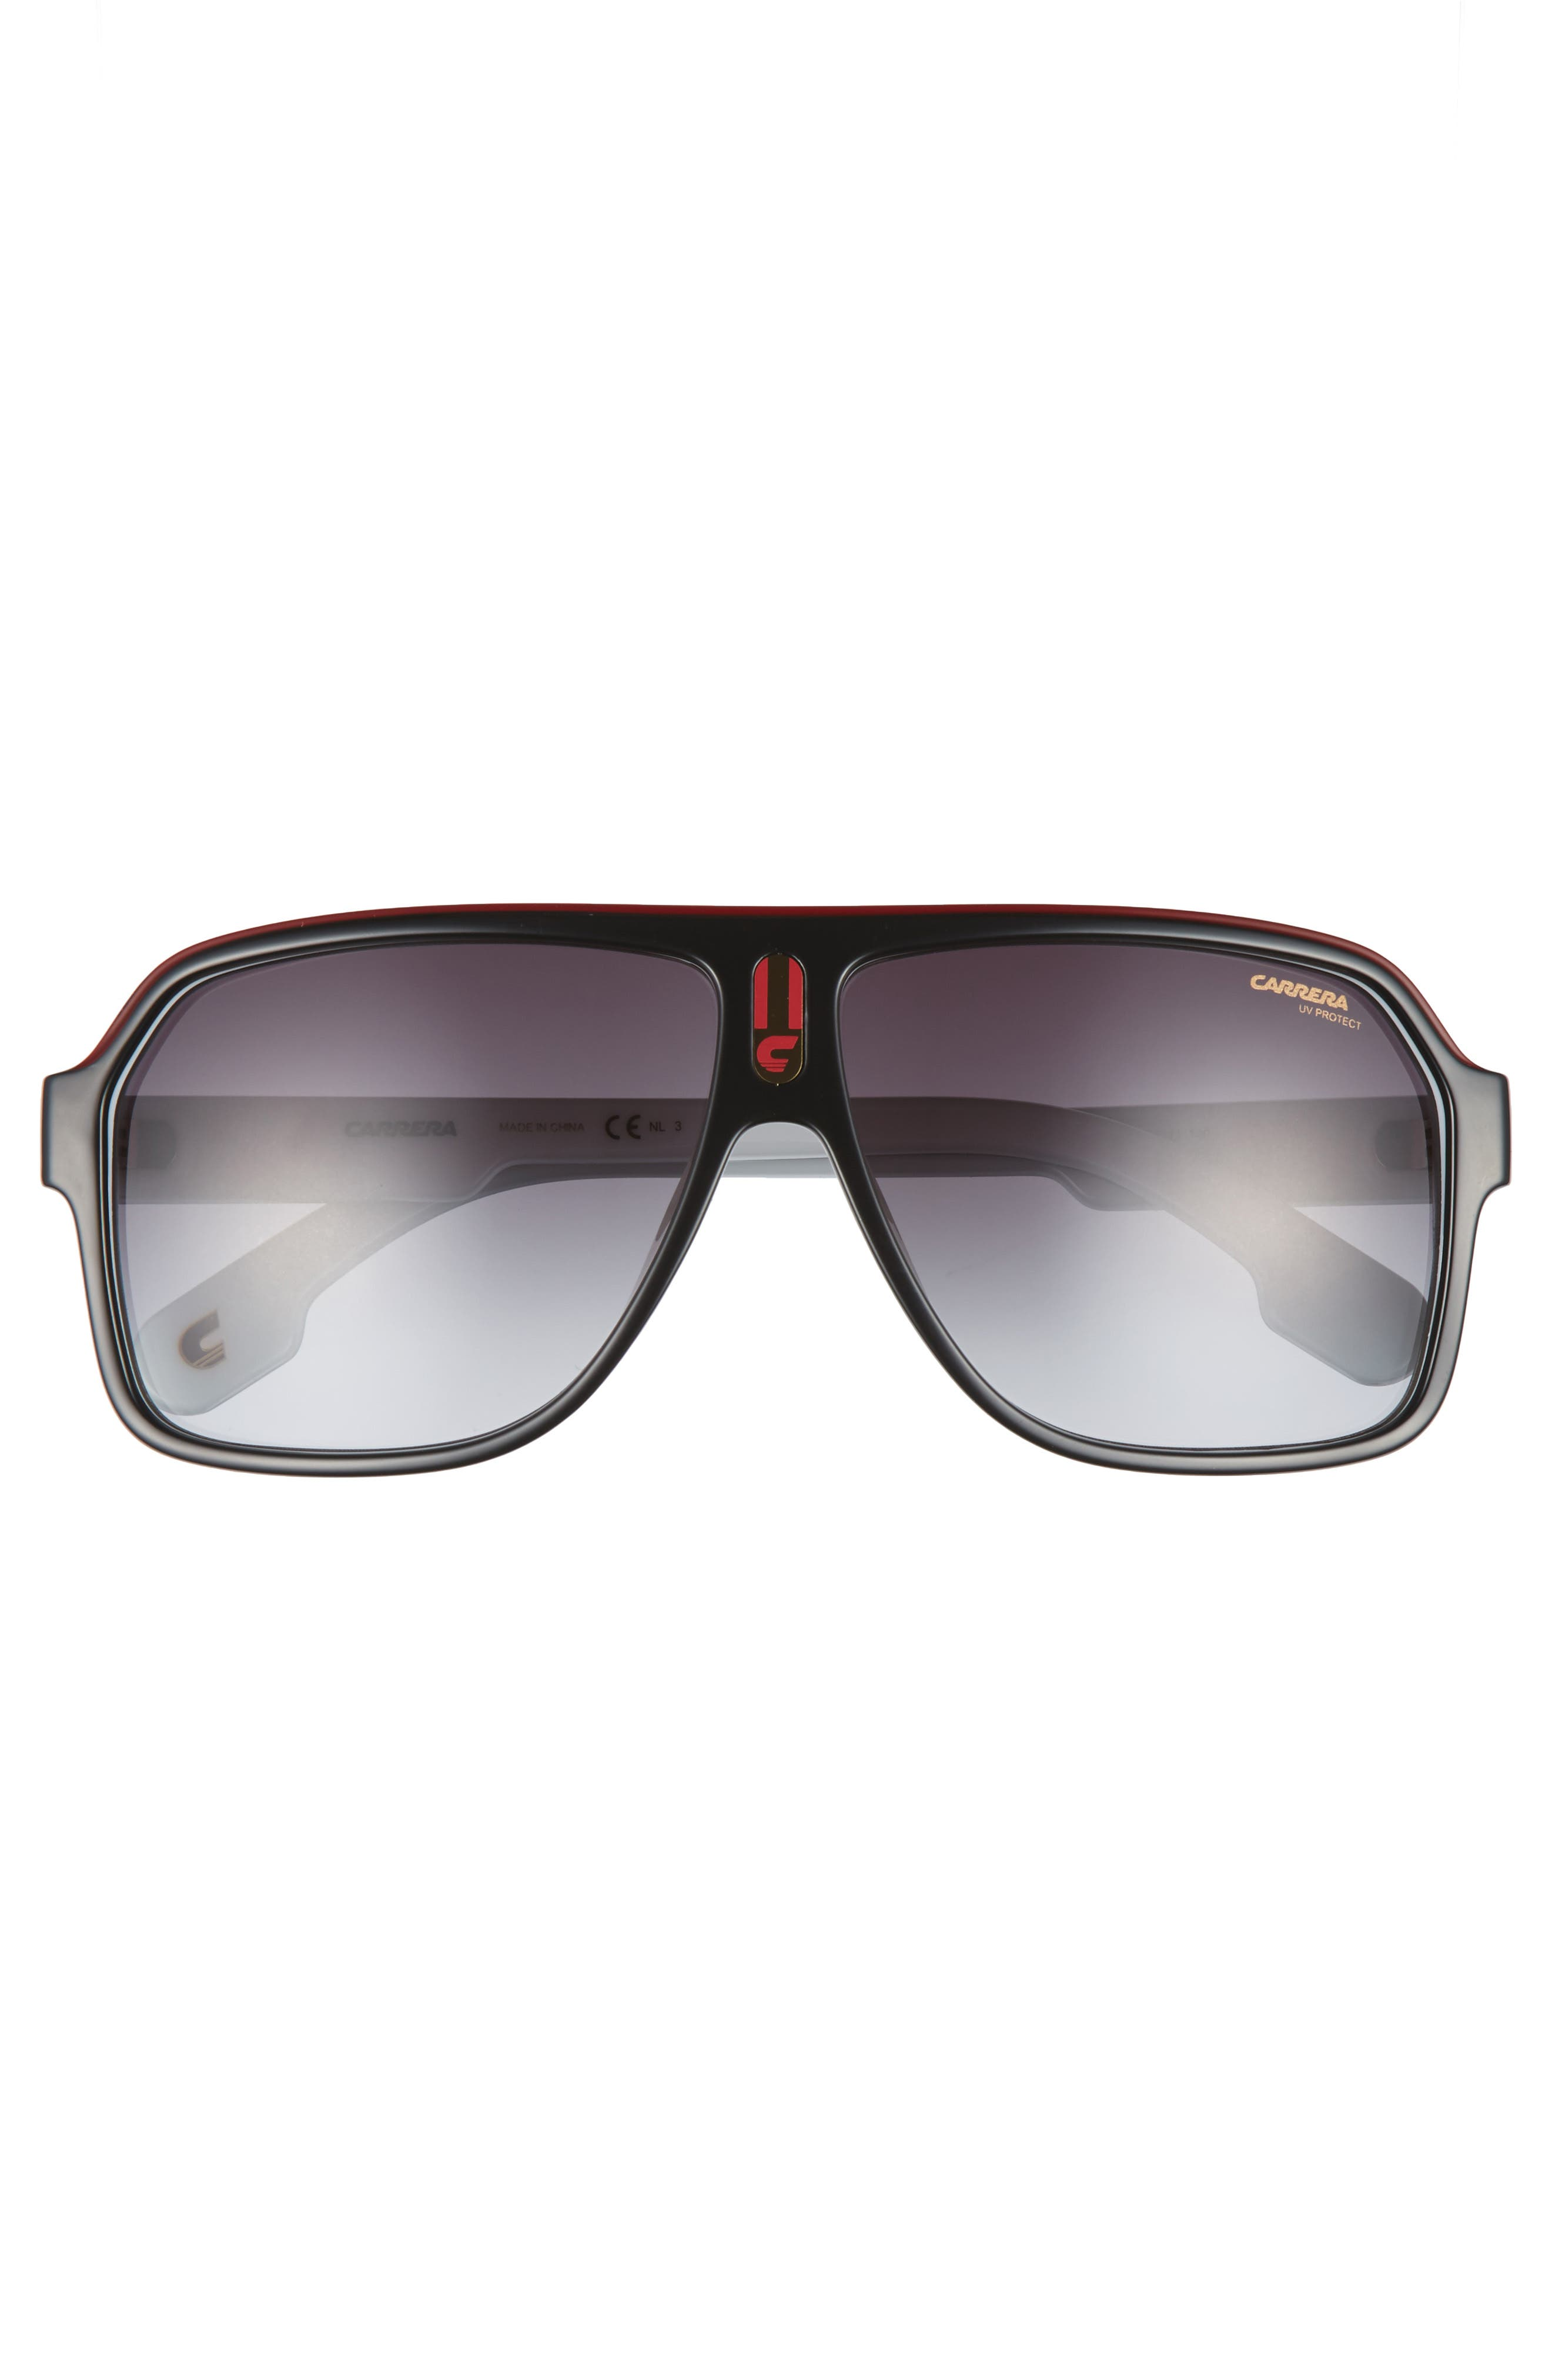 1001/S 62mm Sunglasses,                             Alternate thumbnail 2, color,                             BLACK WHITE